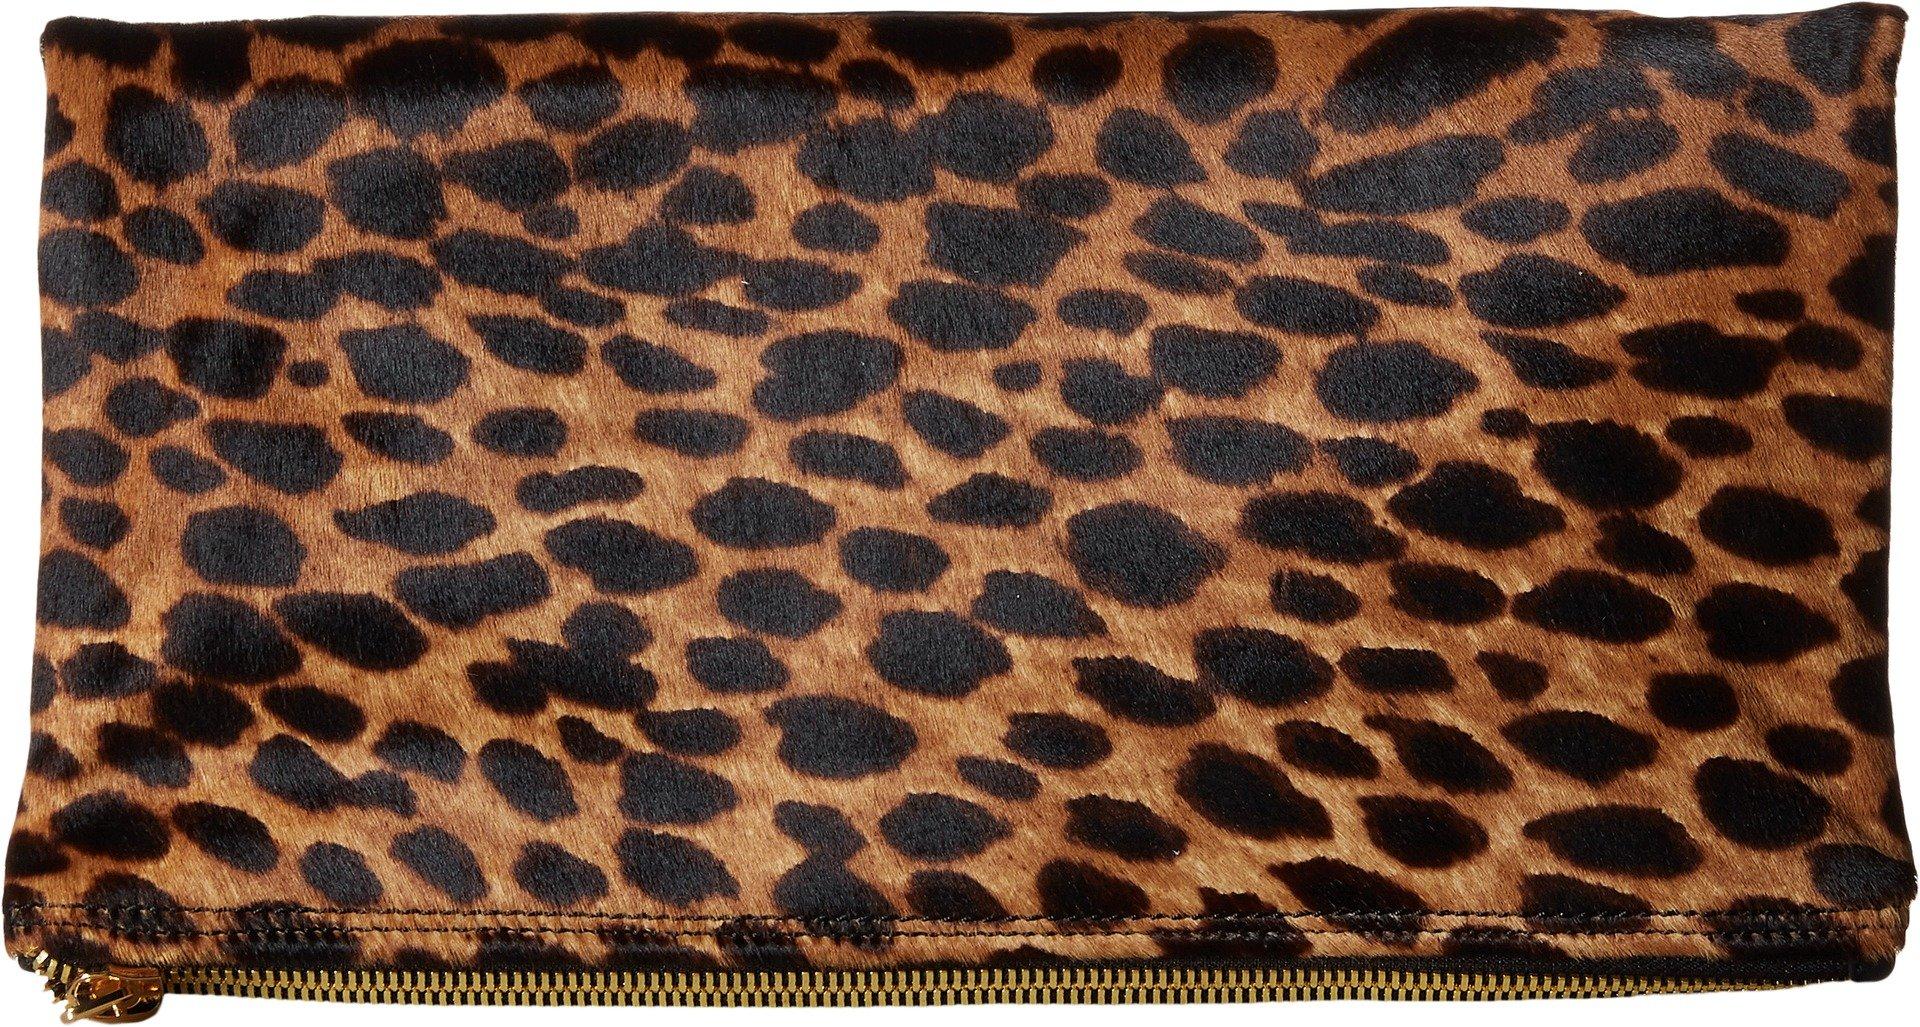 McQ Women's 352424R1B98 9032 Fold Clutch White Leopard Pixel Leopard One Size by McQ